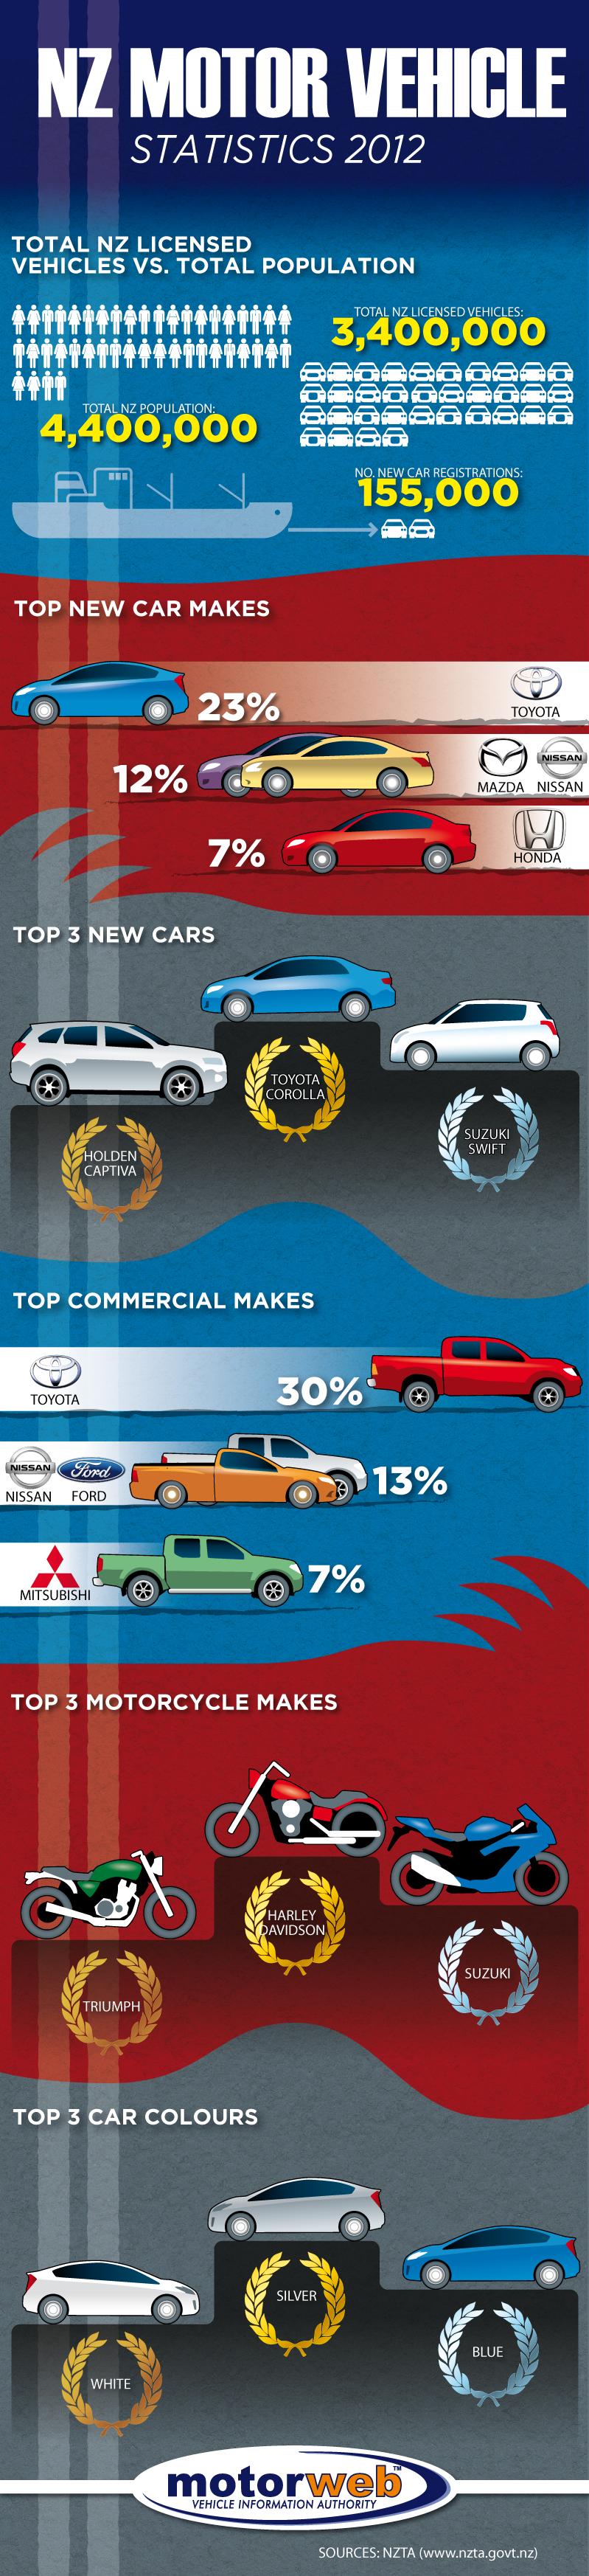 NZ Motor Vehicle Stats 2012